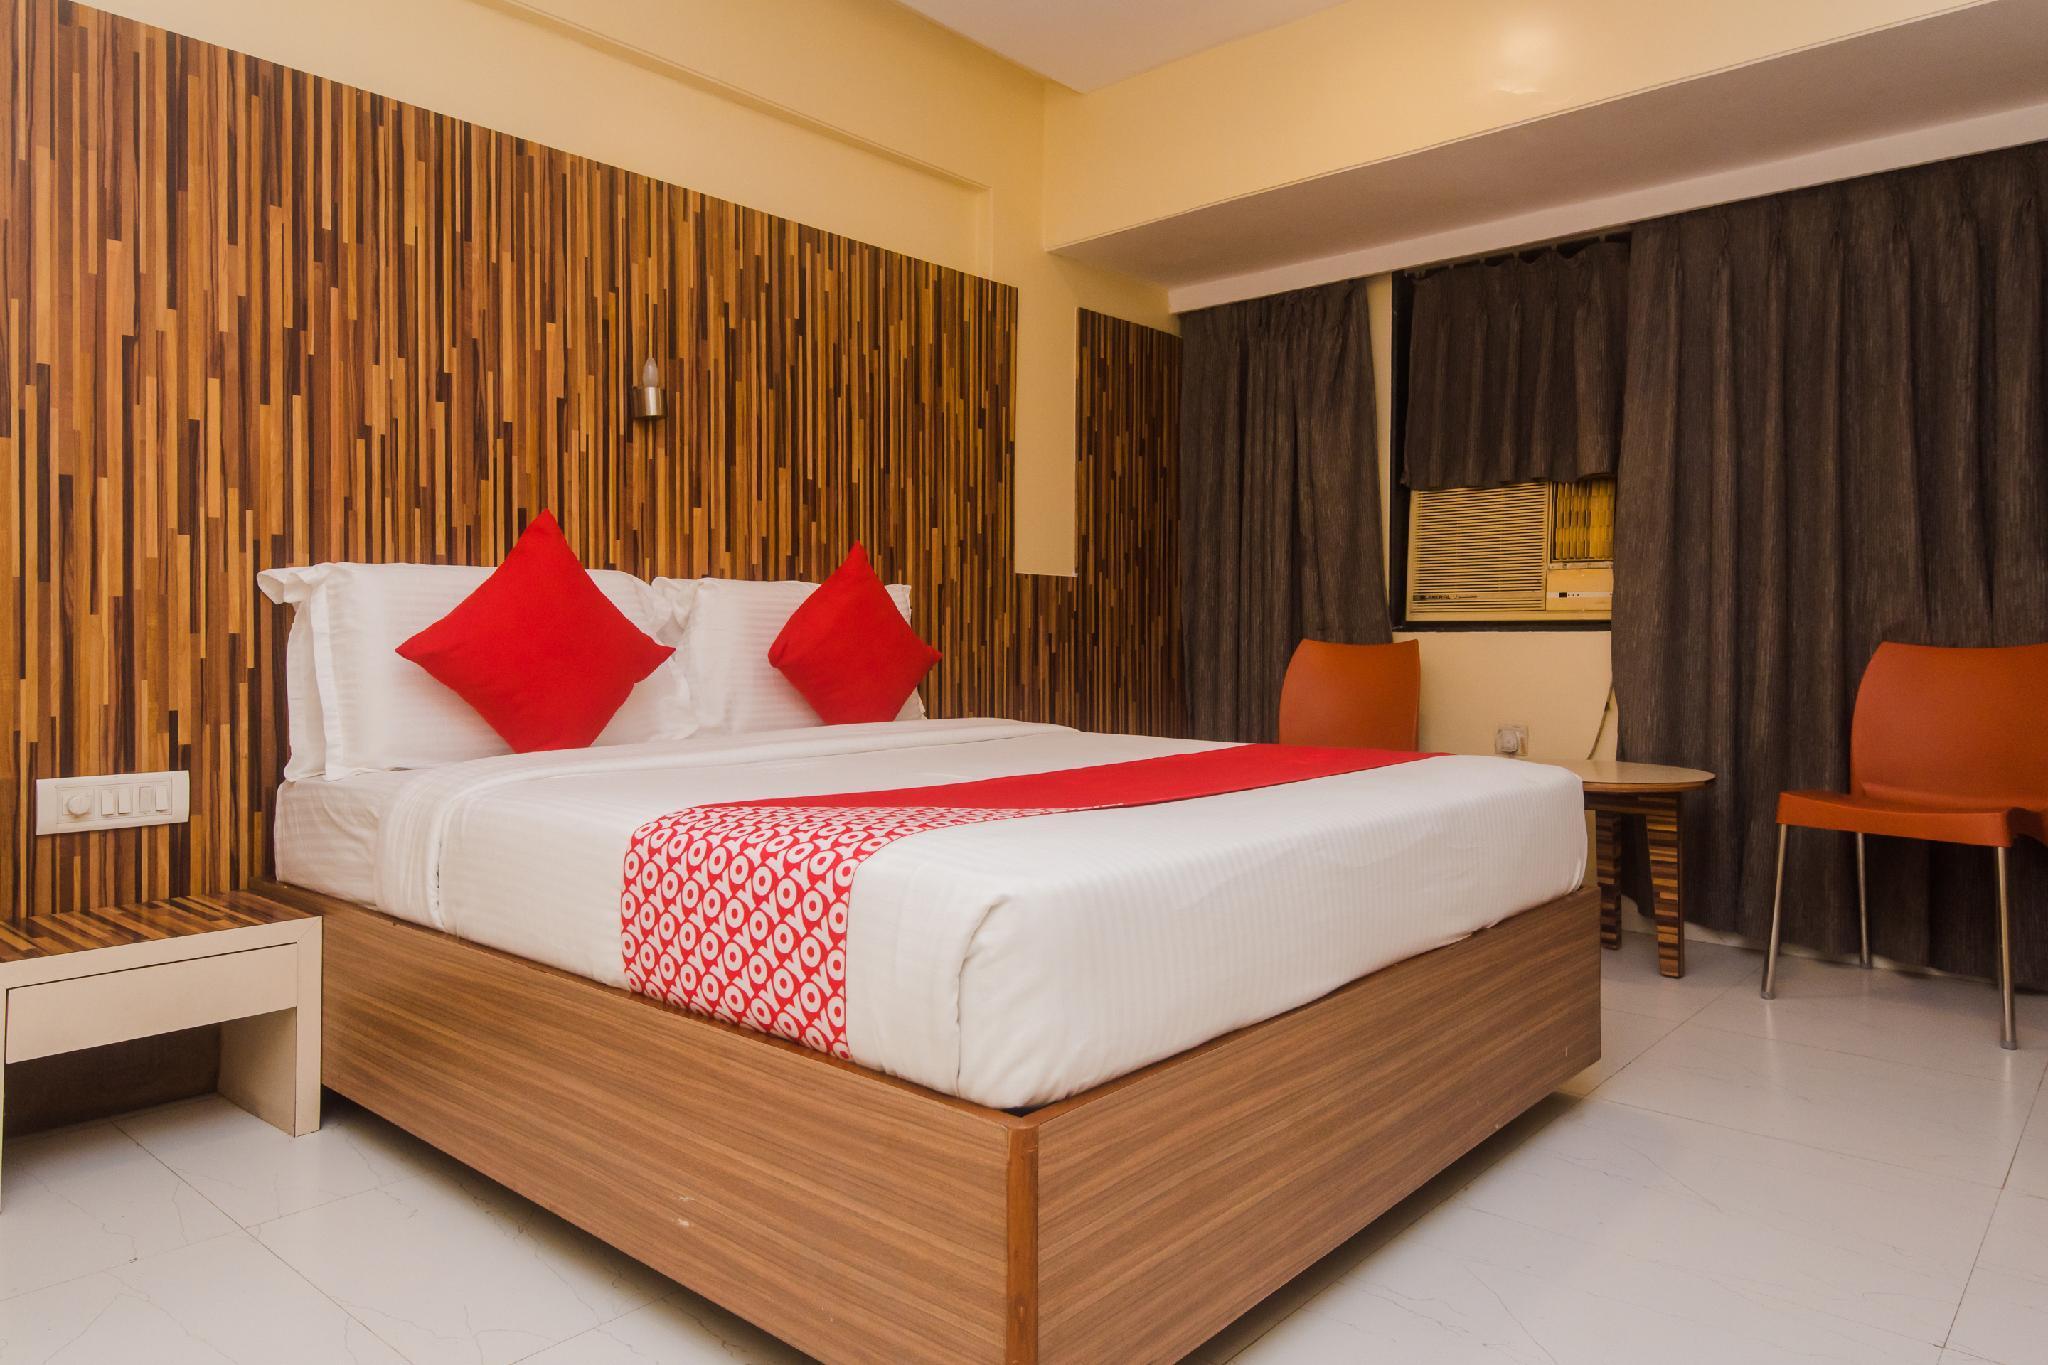 OYO 22007 Hotel Kuber Hospitality